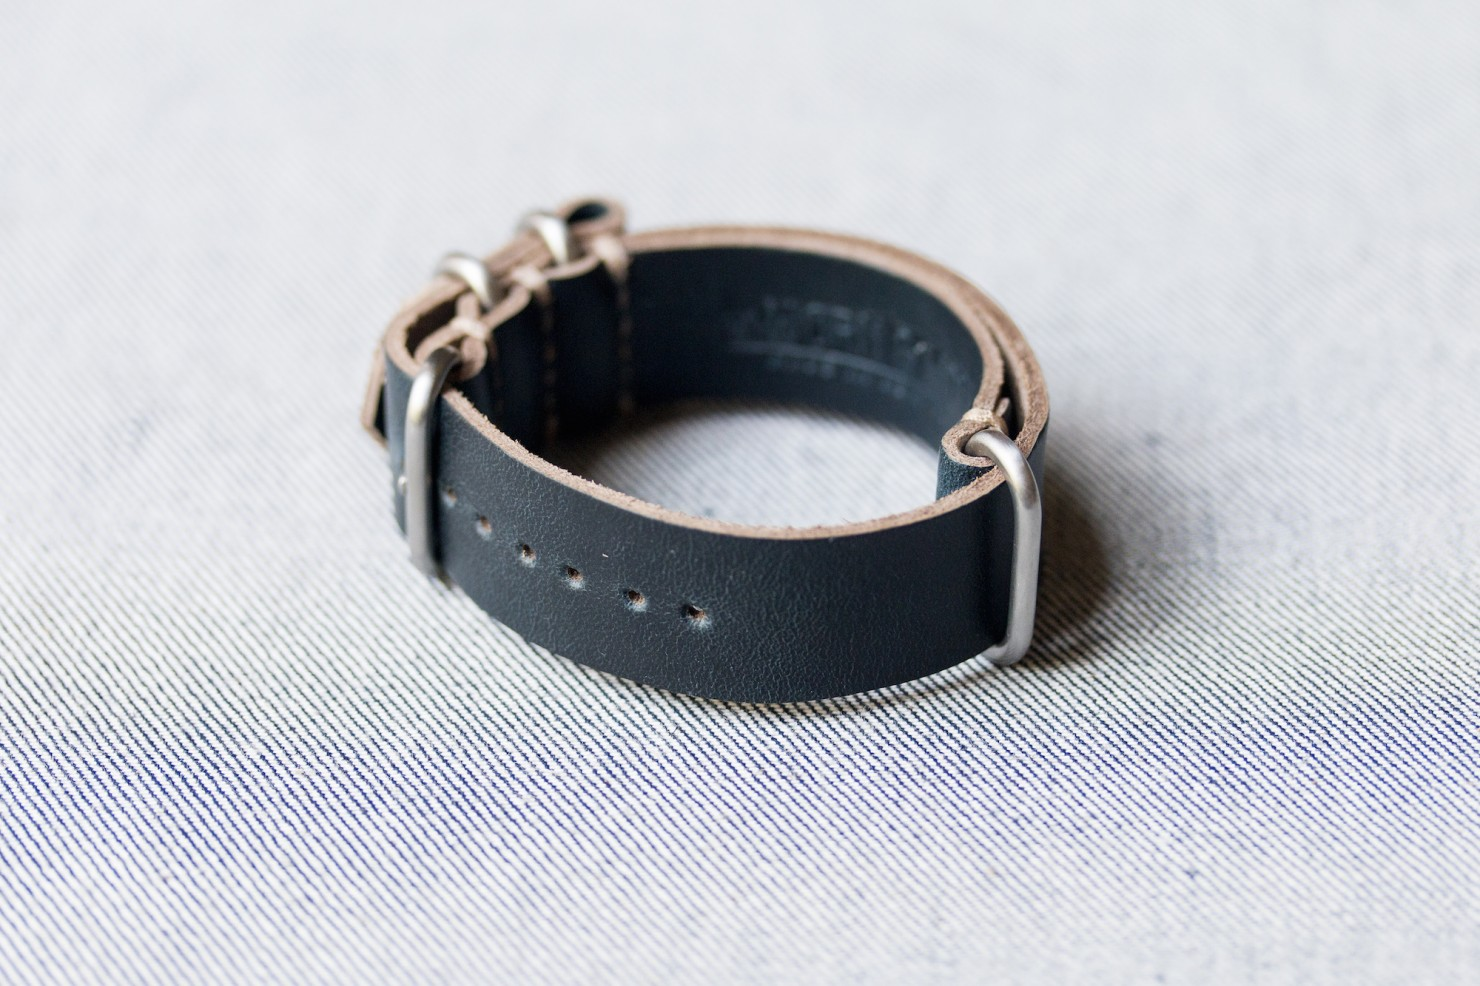 Military Watch Strap by Worn & Wound 3